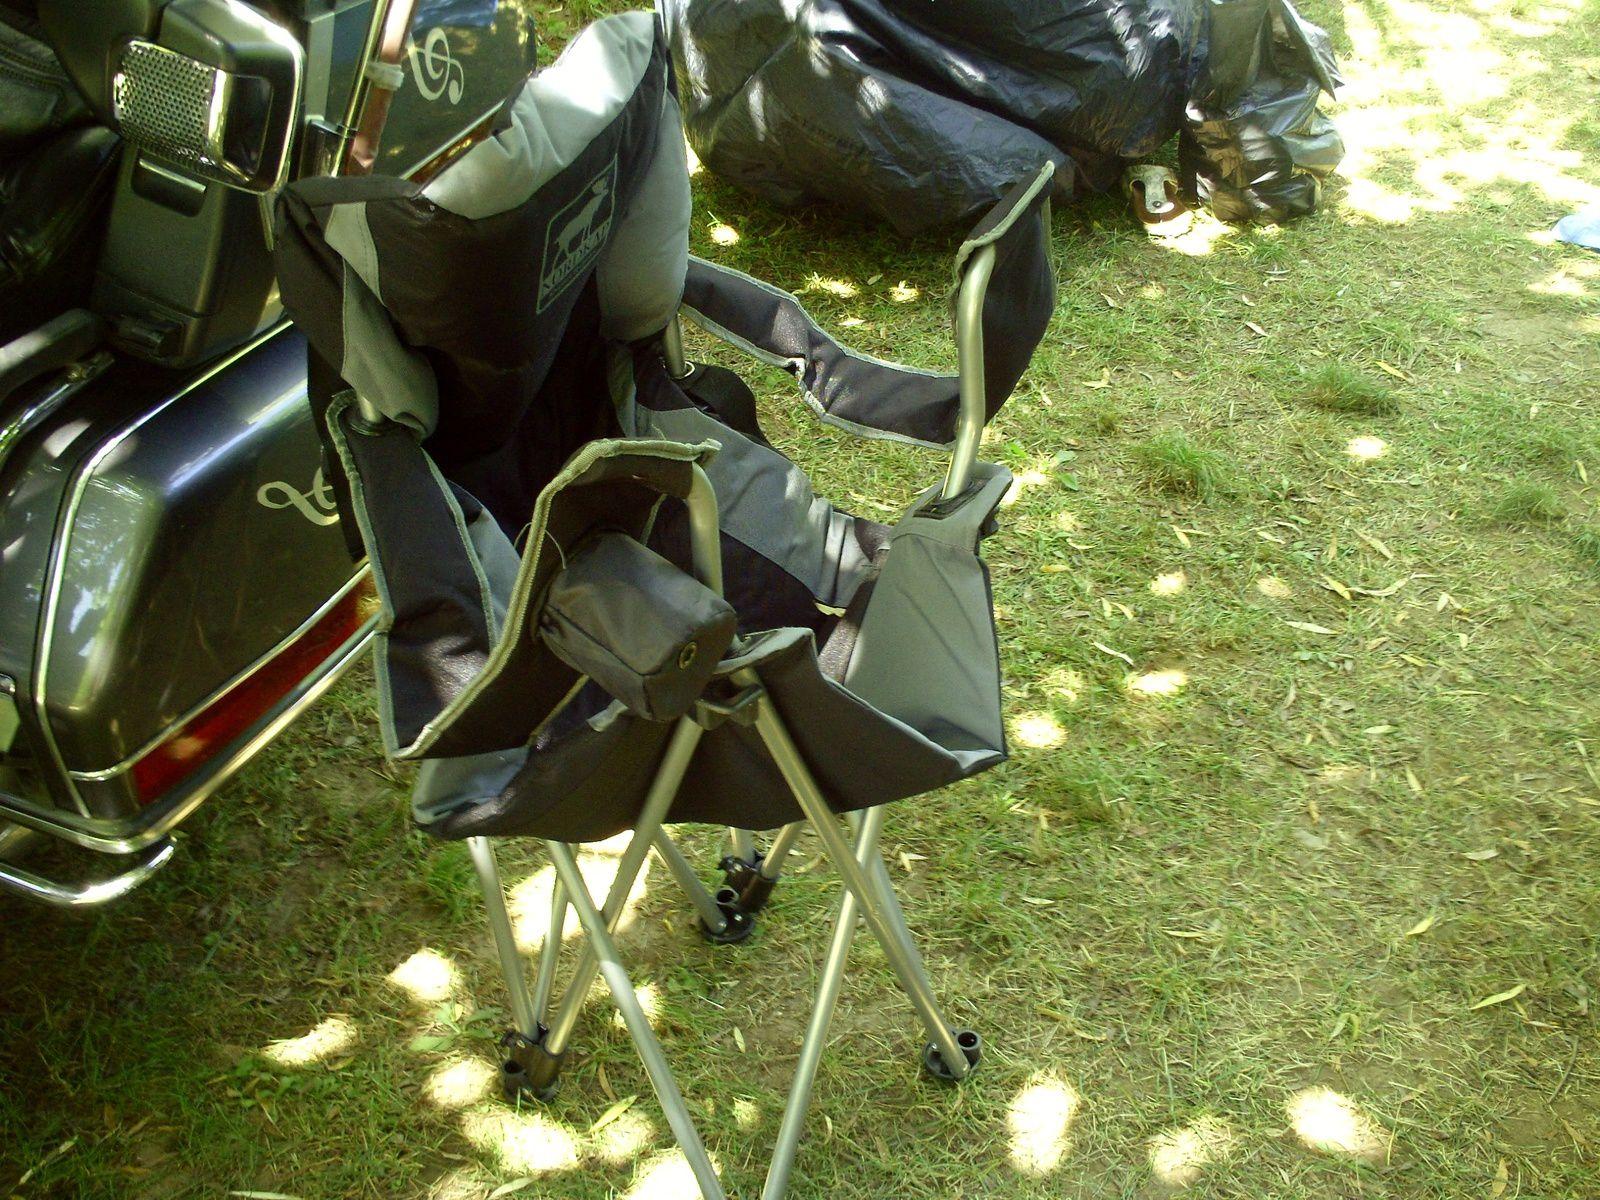 Goldwing - Notre tente KHYAM Freelander camping moto